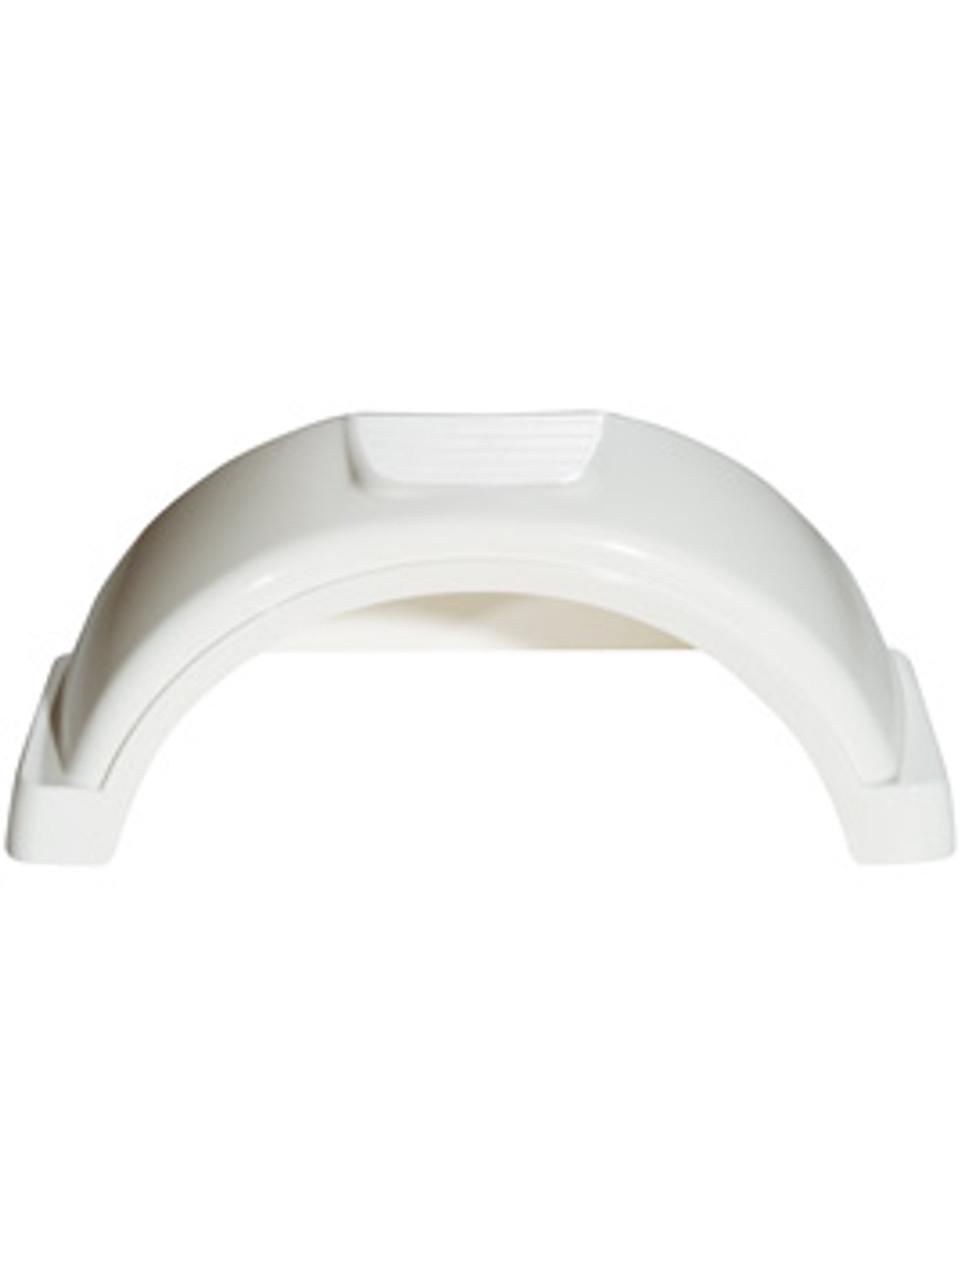 "PF8543 --- Fulton Plastic Fender - 13"" Tire Size - White"